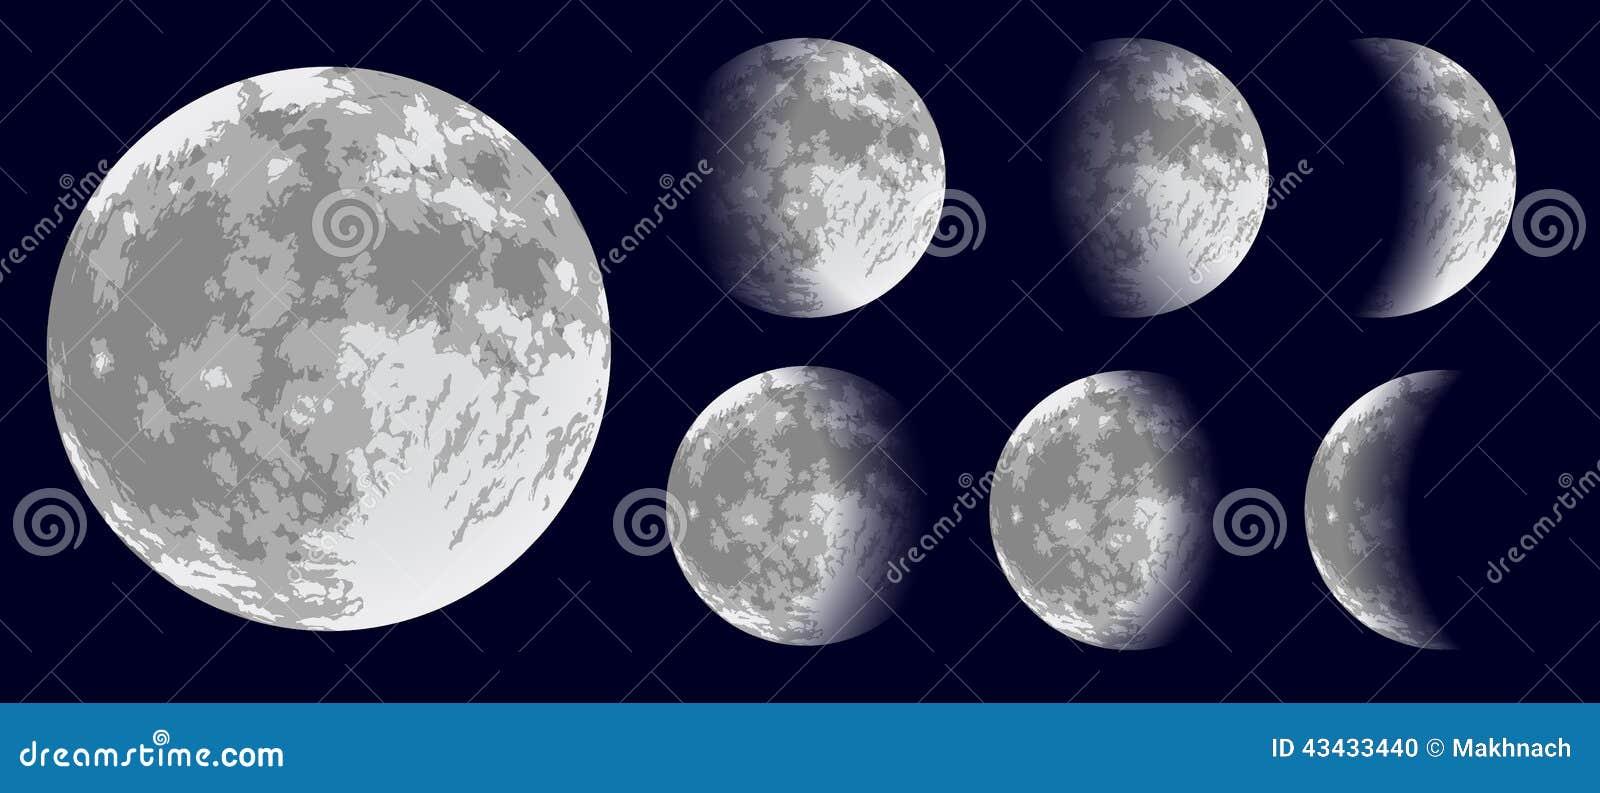 Moon Calendar Illustration : Moon phases vector illustration stock image